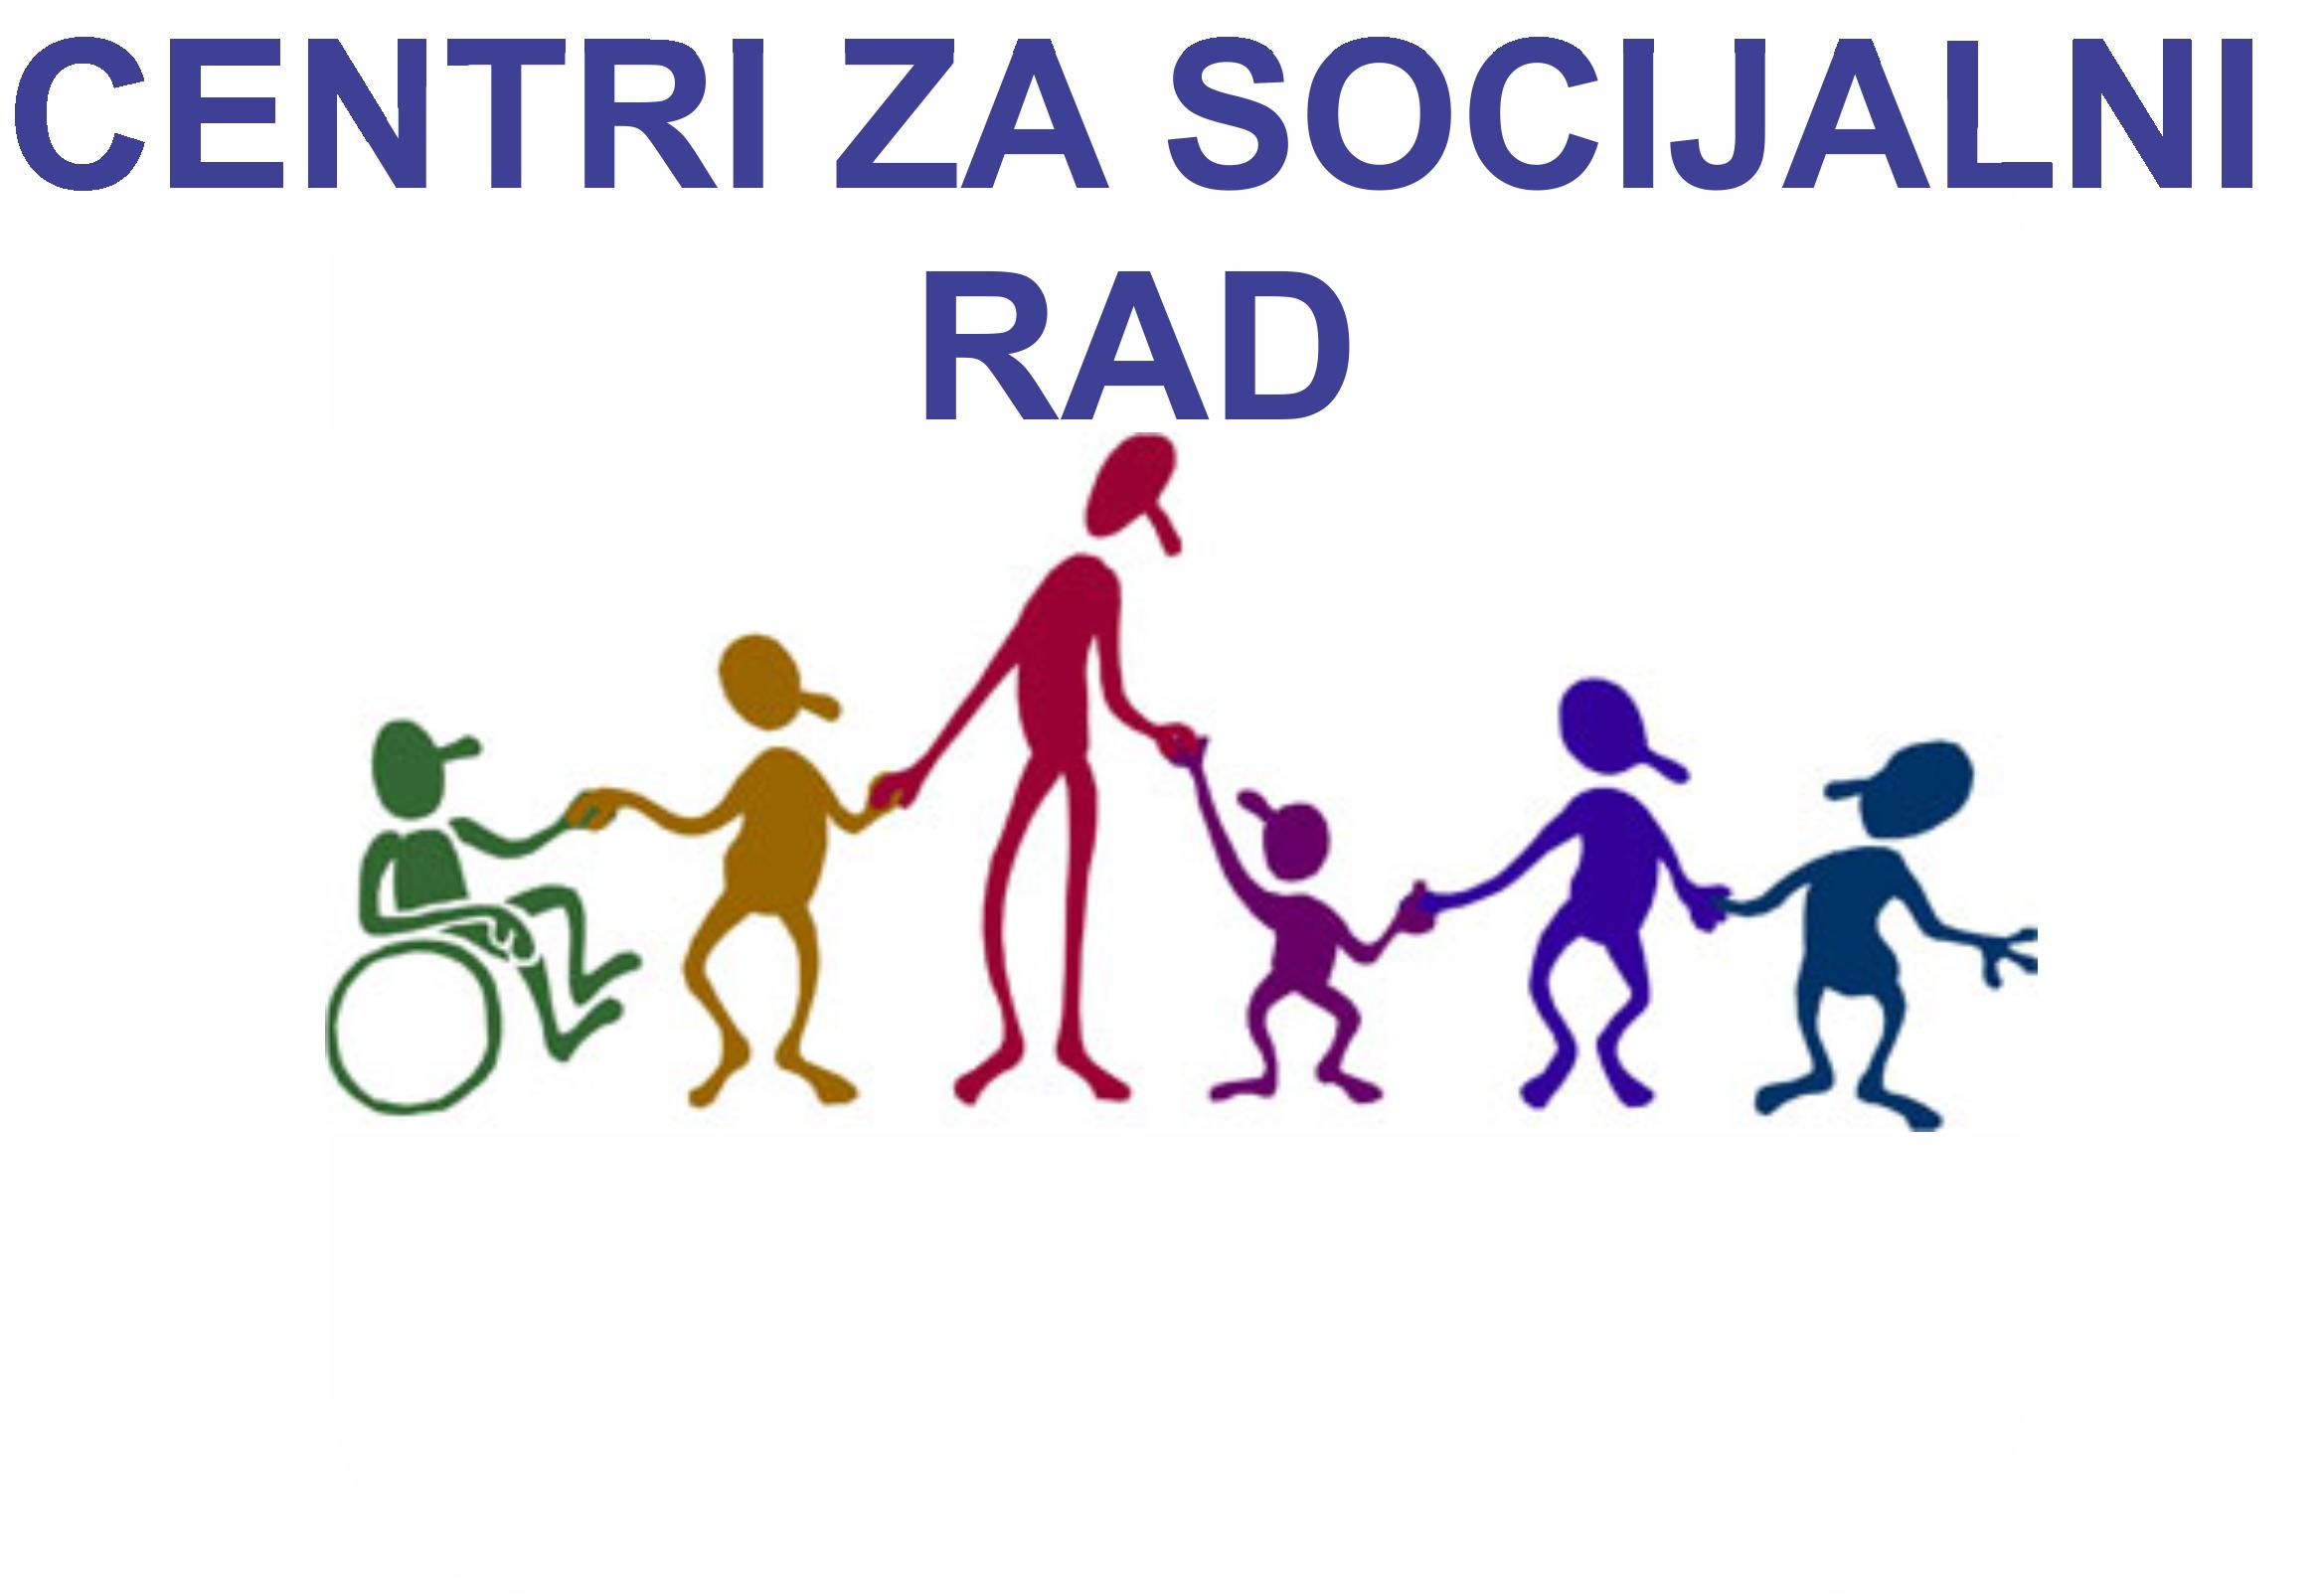 Fice-Clanica-Centri-za-Socijalni-Rad.png